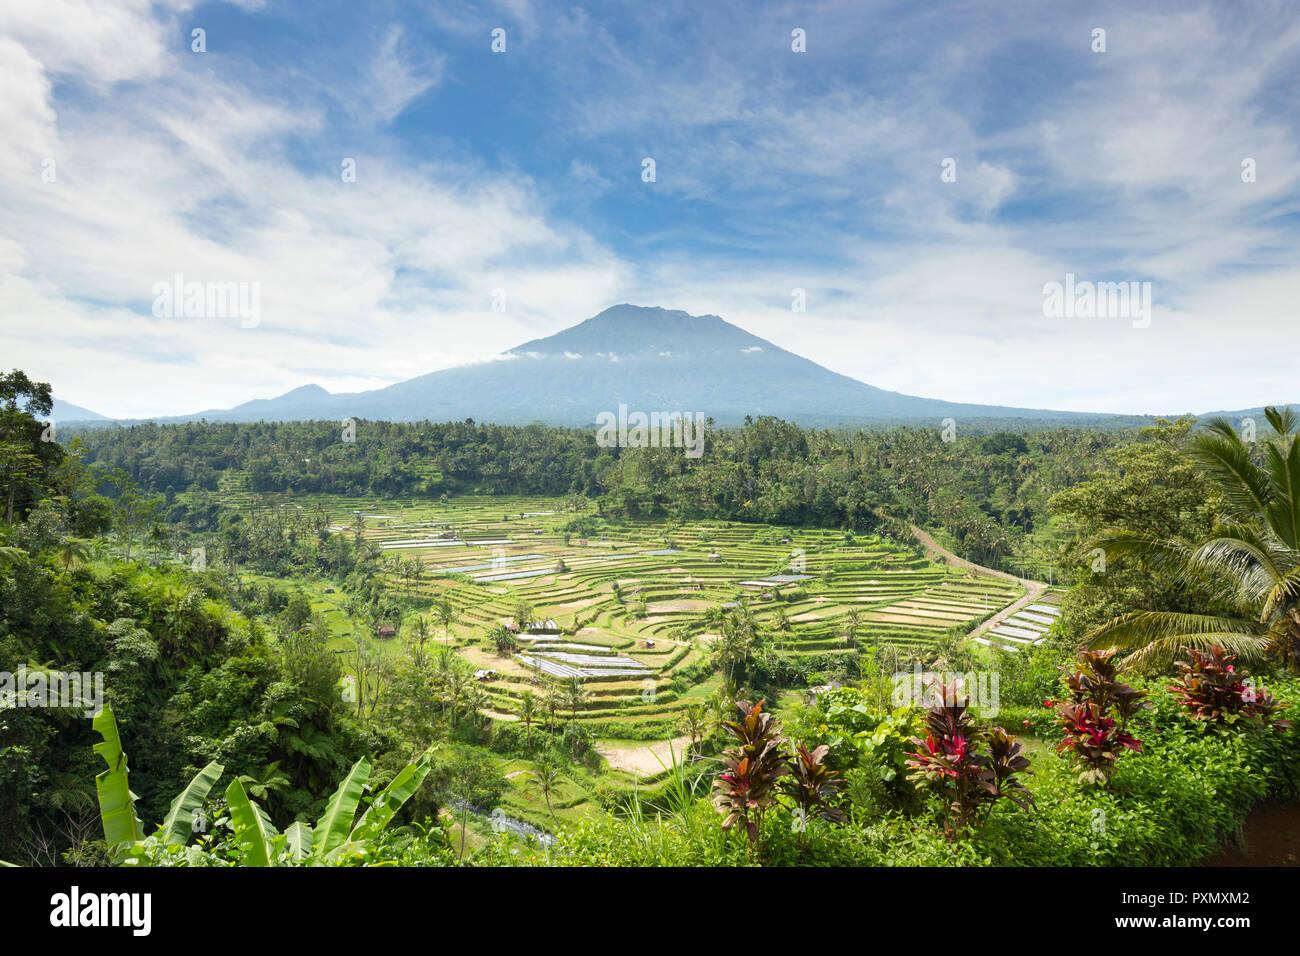 Vista dei terrazzi di riso e Gunung Agung vulcano, Rendang, Bali, Indonesia Immagini Stock